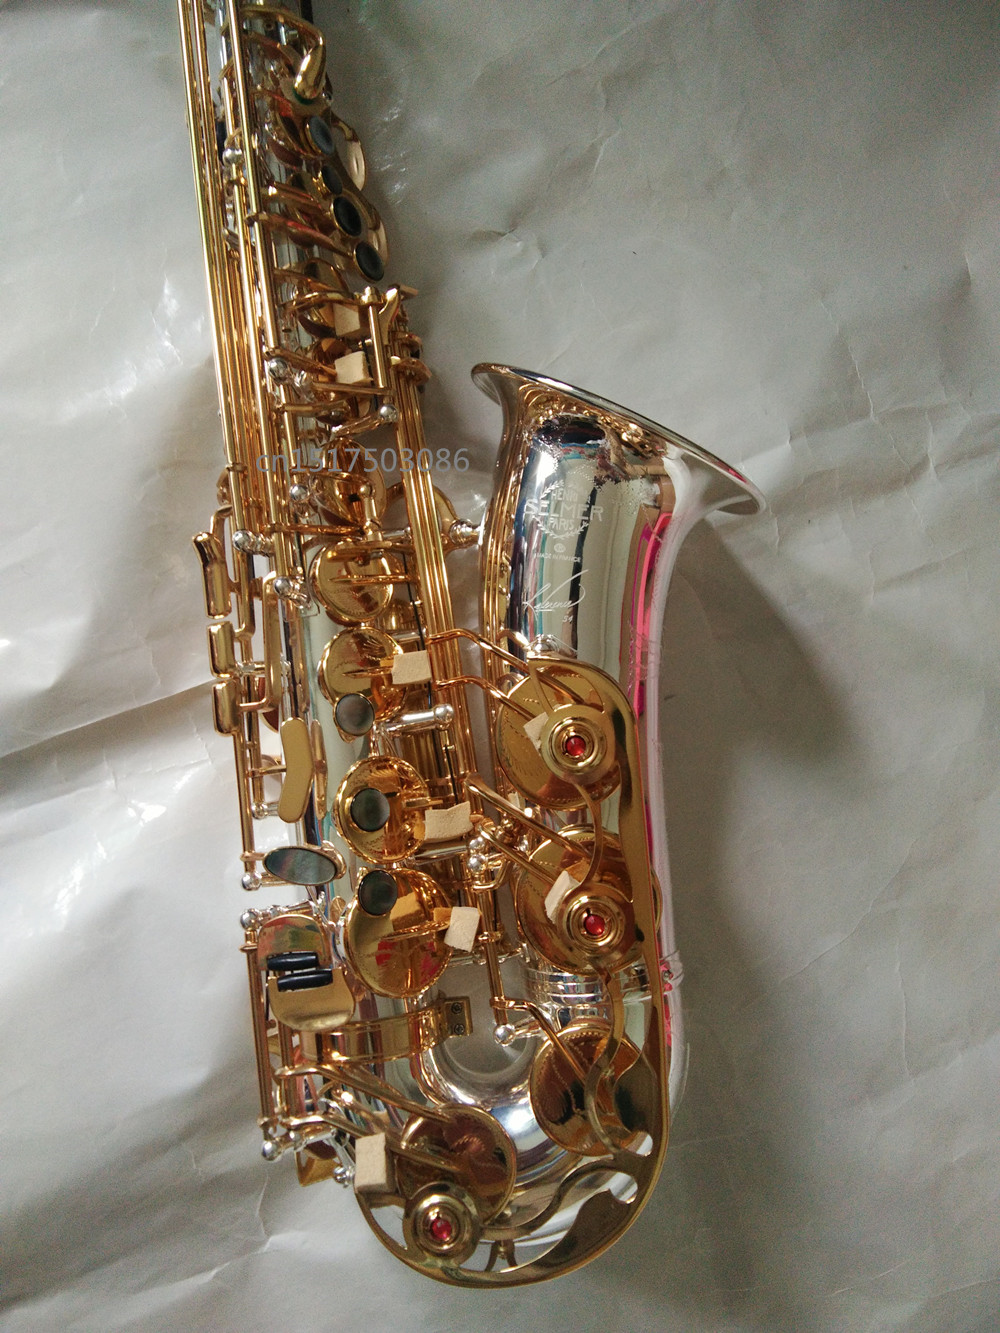 Saxophone instrument Selmer Saxophone Eb Silver Alto Sax Gold key Saxophone Professional Saxophone Mouthpiece Depth engraved brand suzuki eb alto saxophone as 500n drop e saxophone surface to electroplating black nickel gold the paint sax instrument